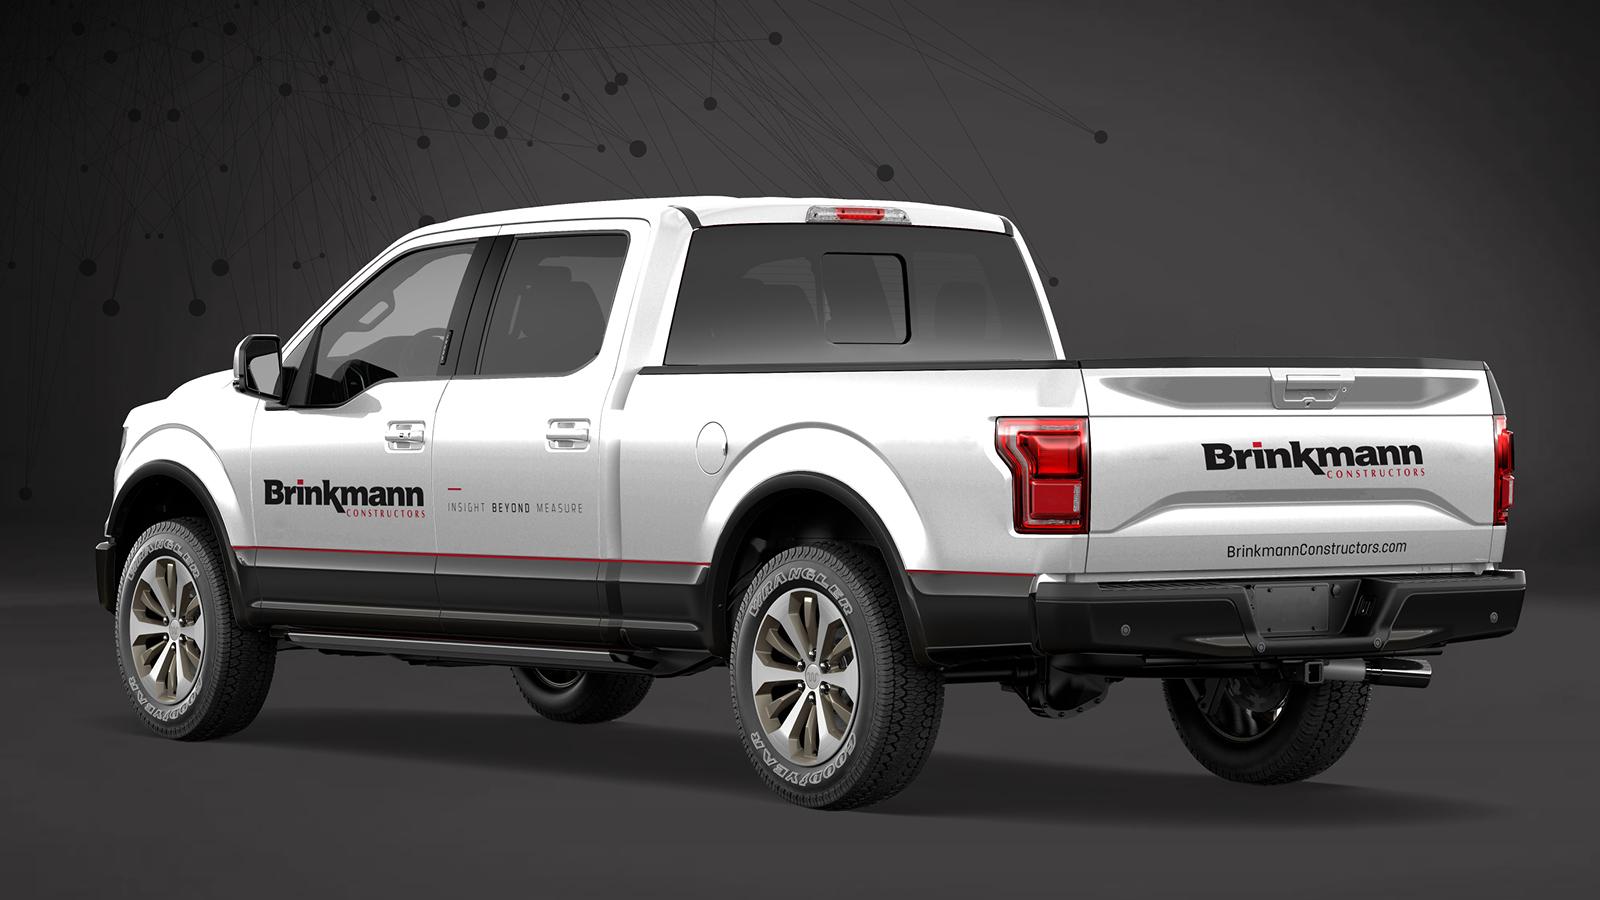 Branded Brinkmann Pickup Truck